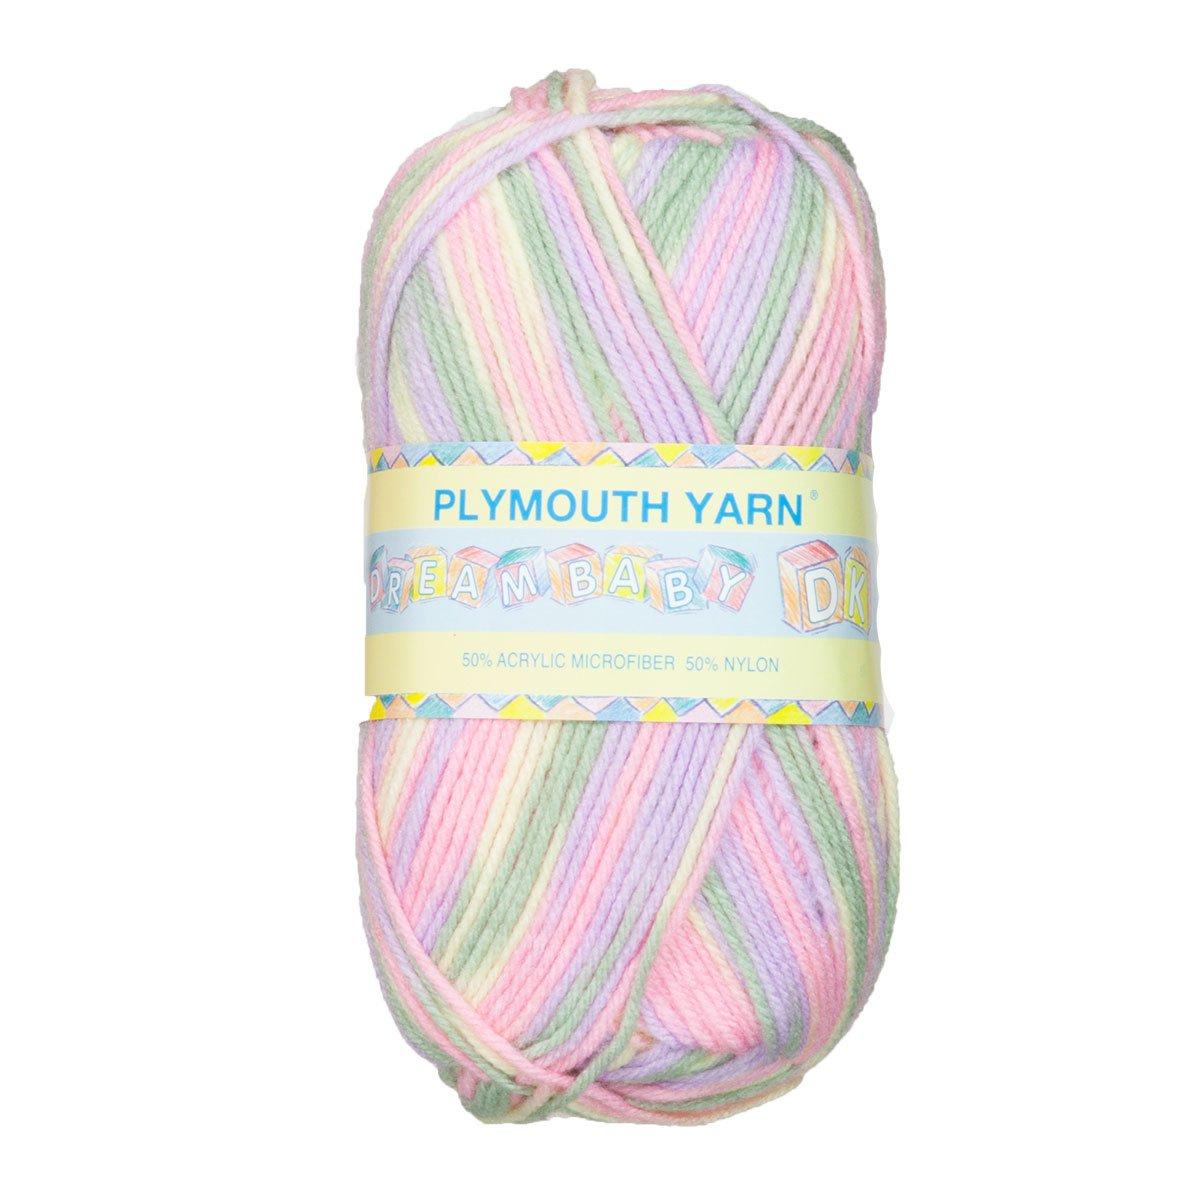 Dreambaby DK - Plymouth Yarn Co.